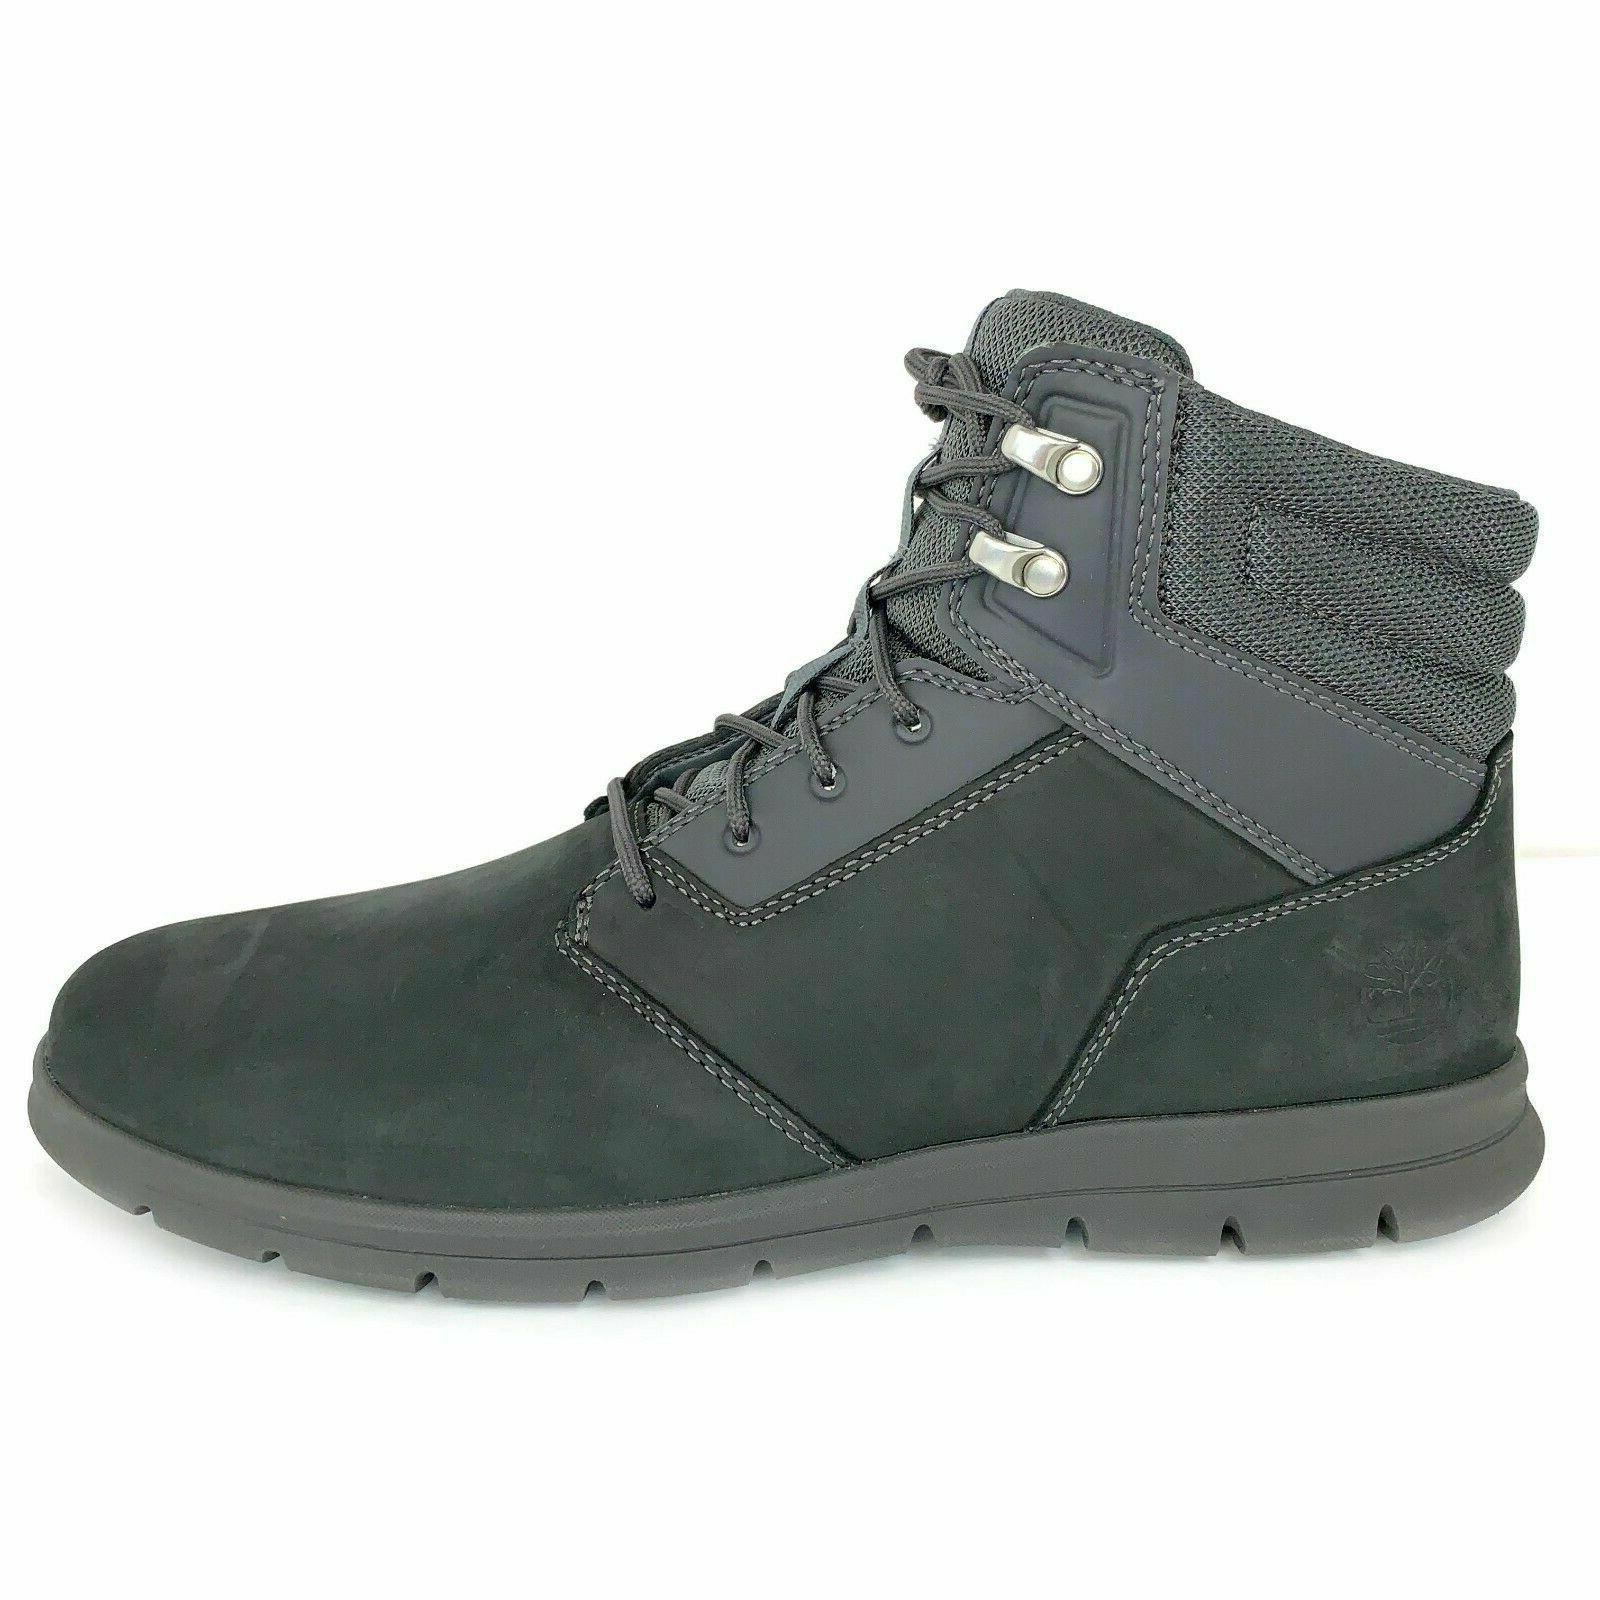 Timberland Graydon Sneakerboot A1OEL Men's Dark Grey Hiking